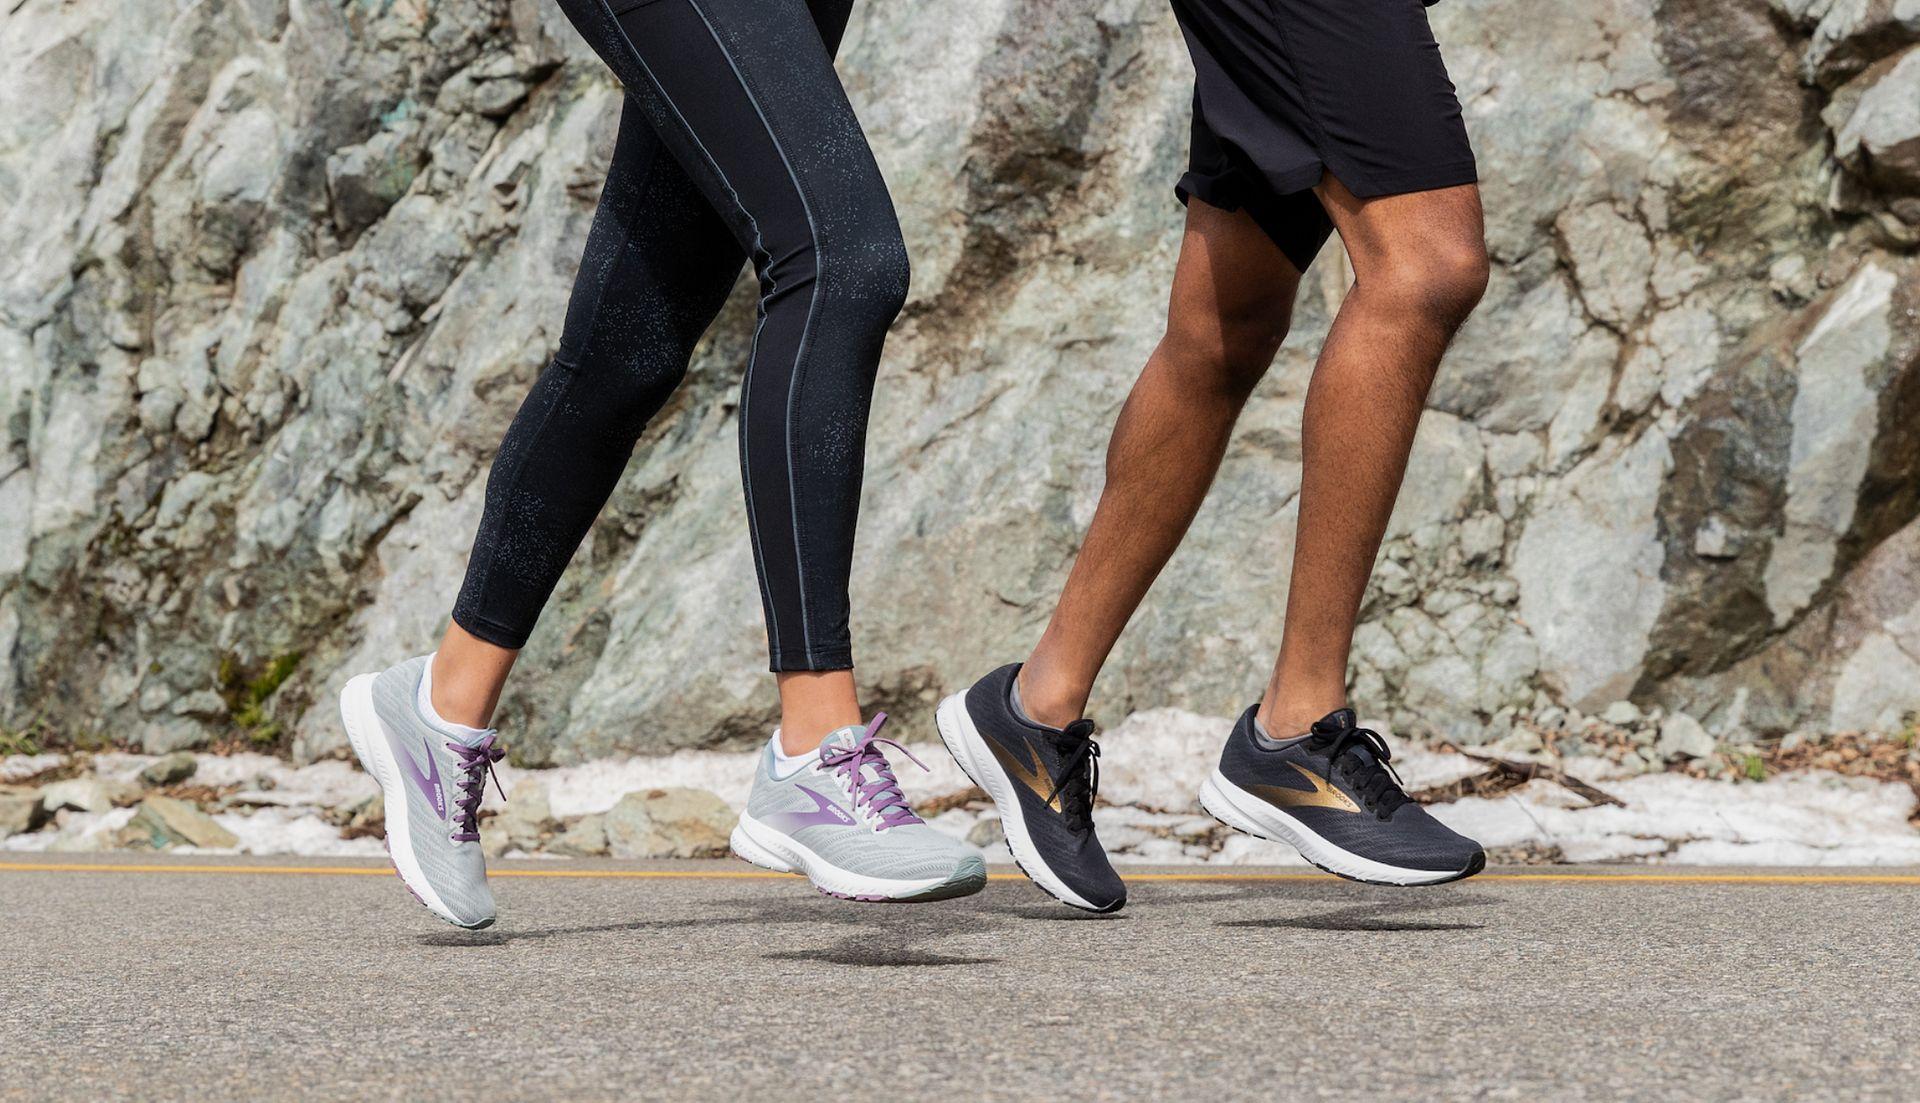 Best Brooks Running Shoes 2020 | Buyer